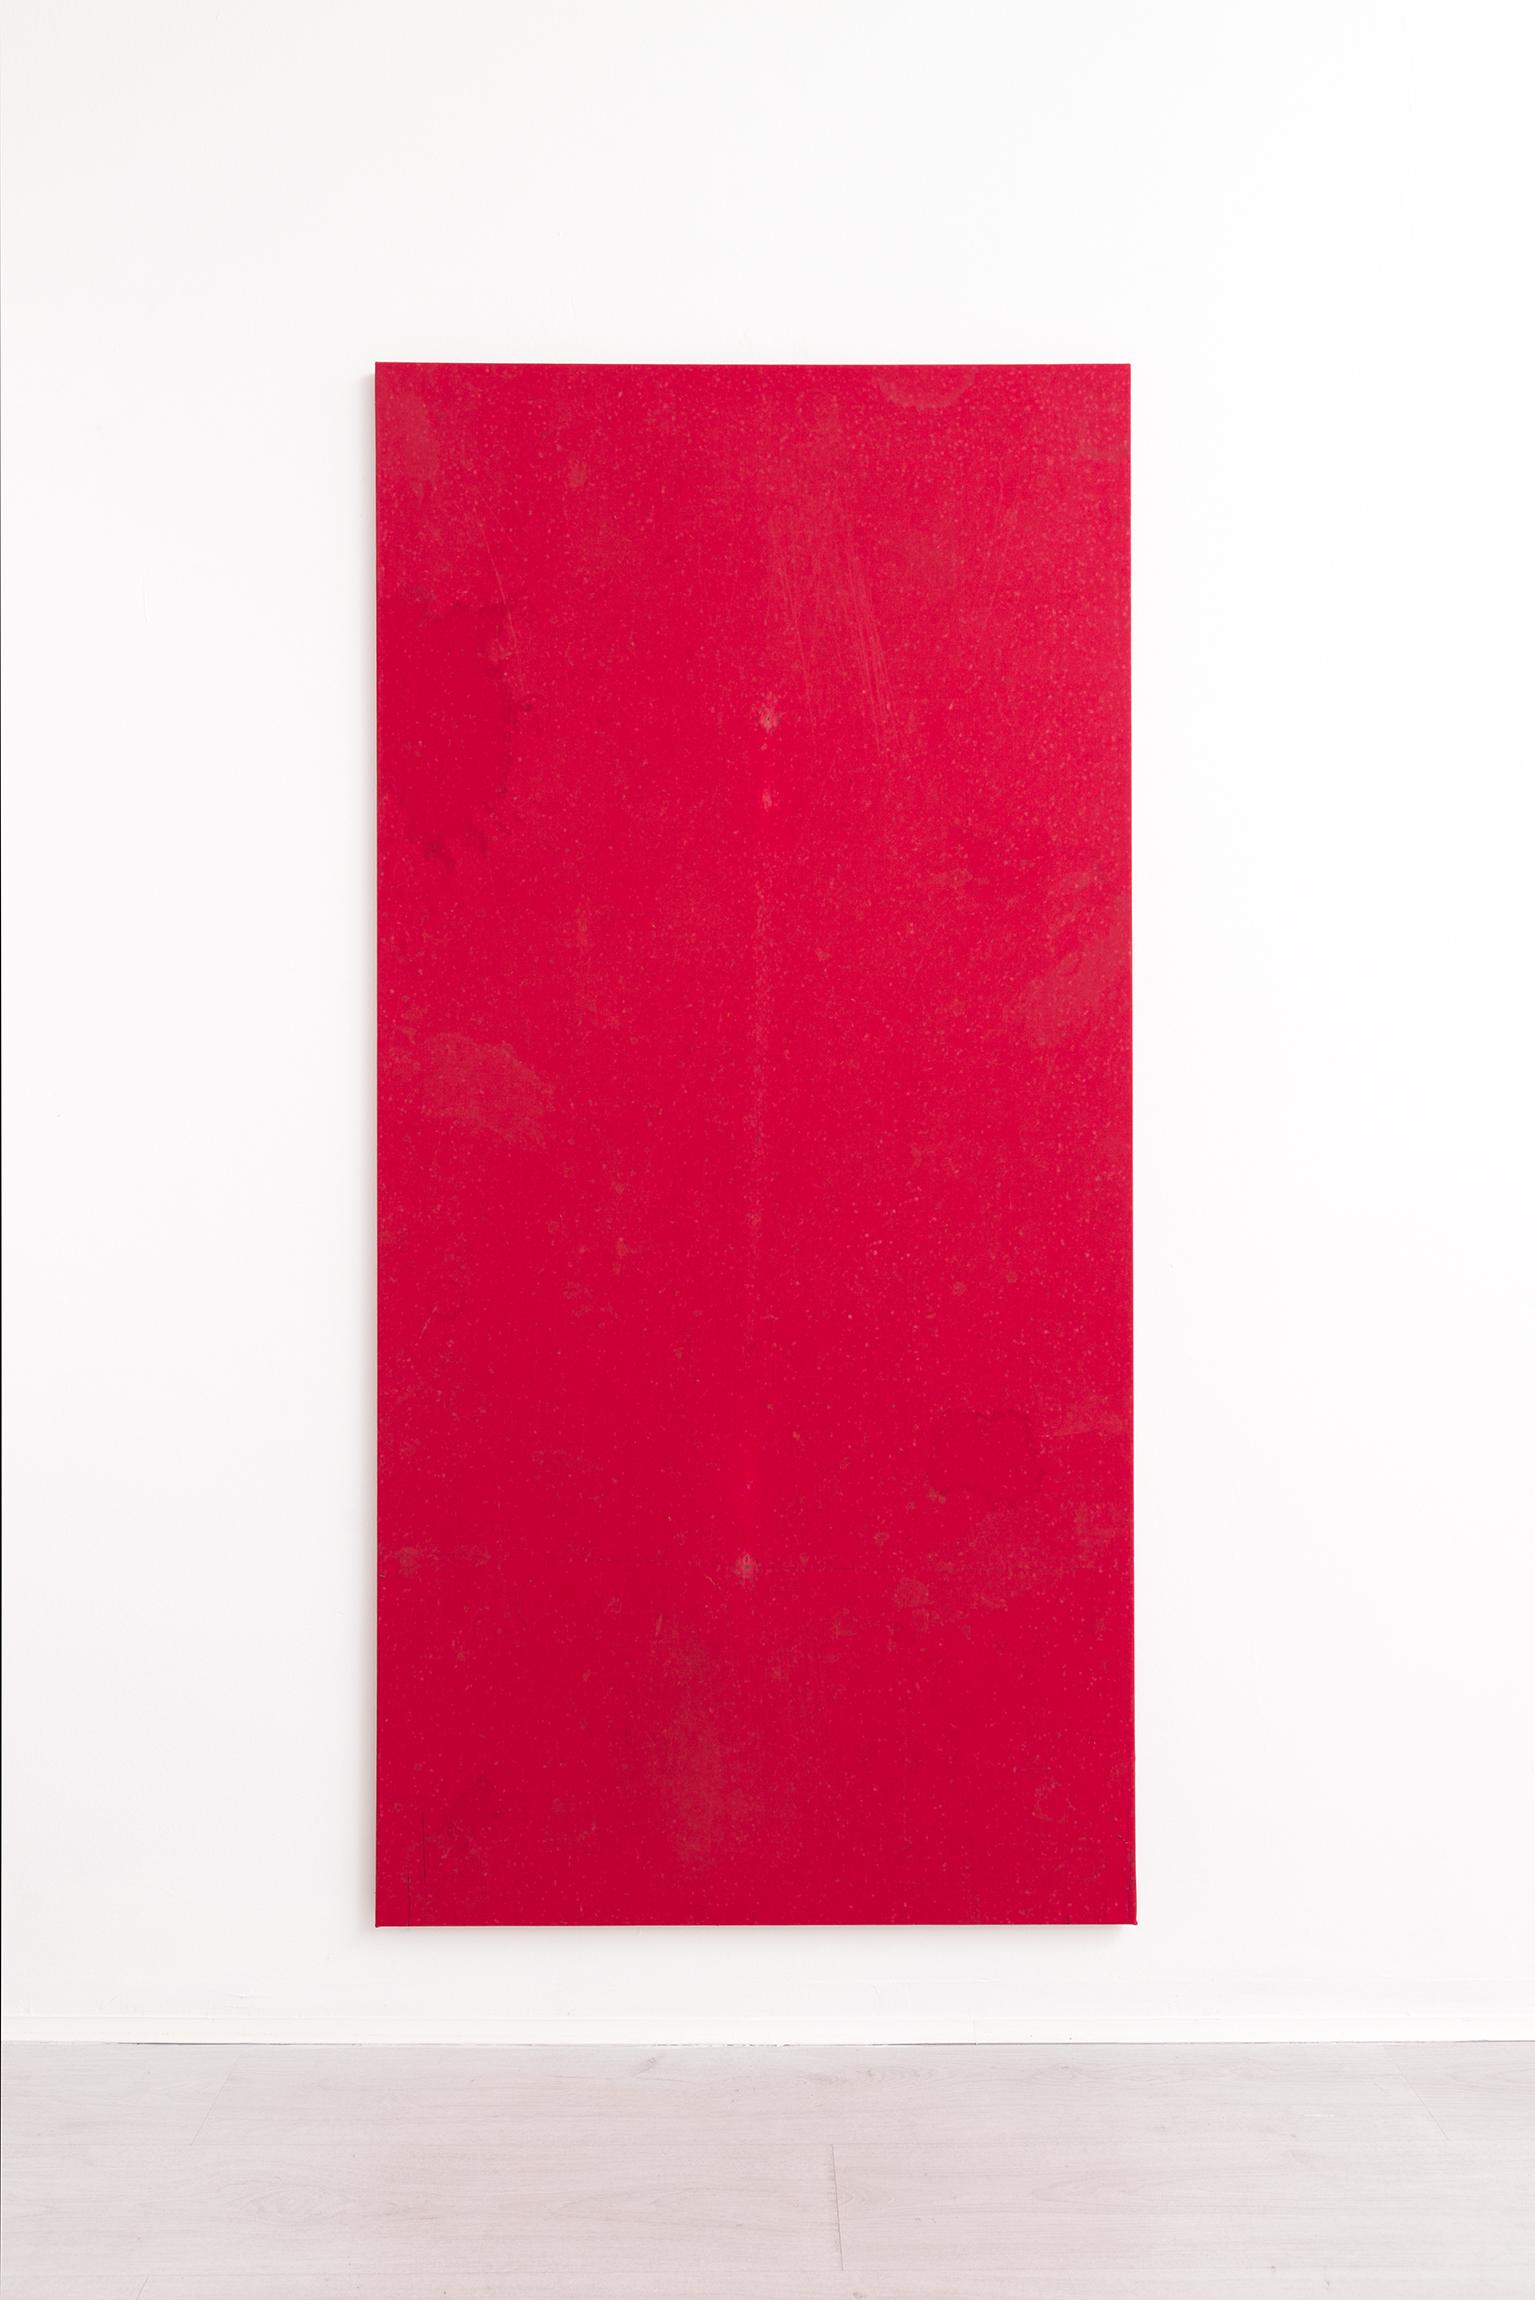 4.Simon Laureyns, used pooltable felt, 190x90cm - 2017